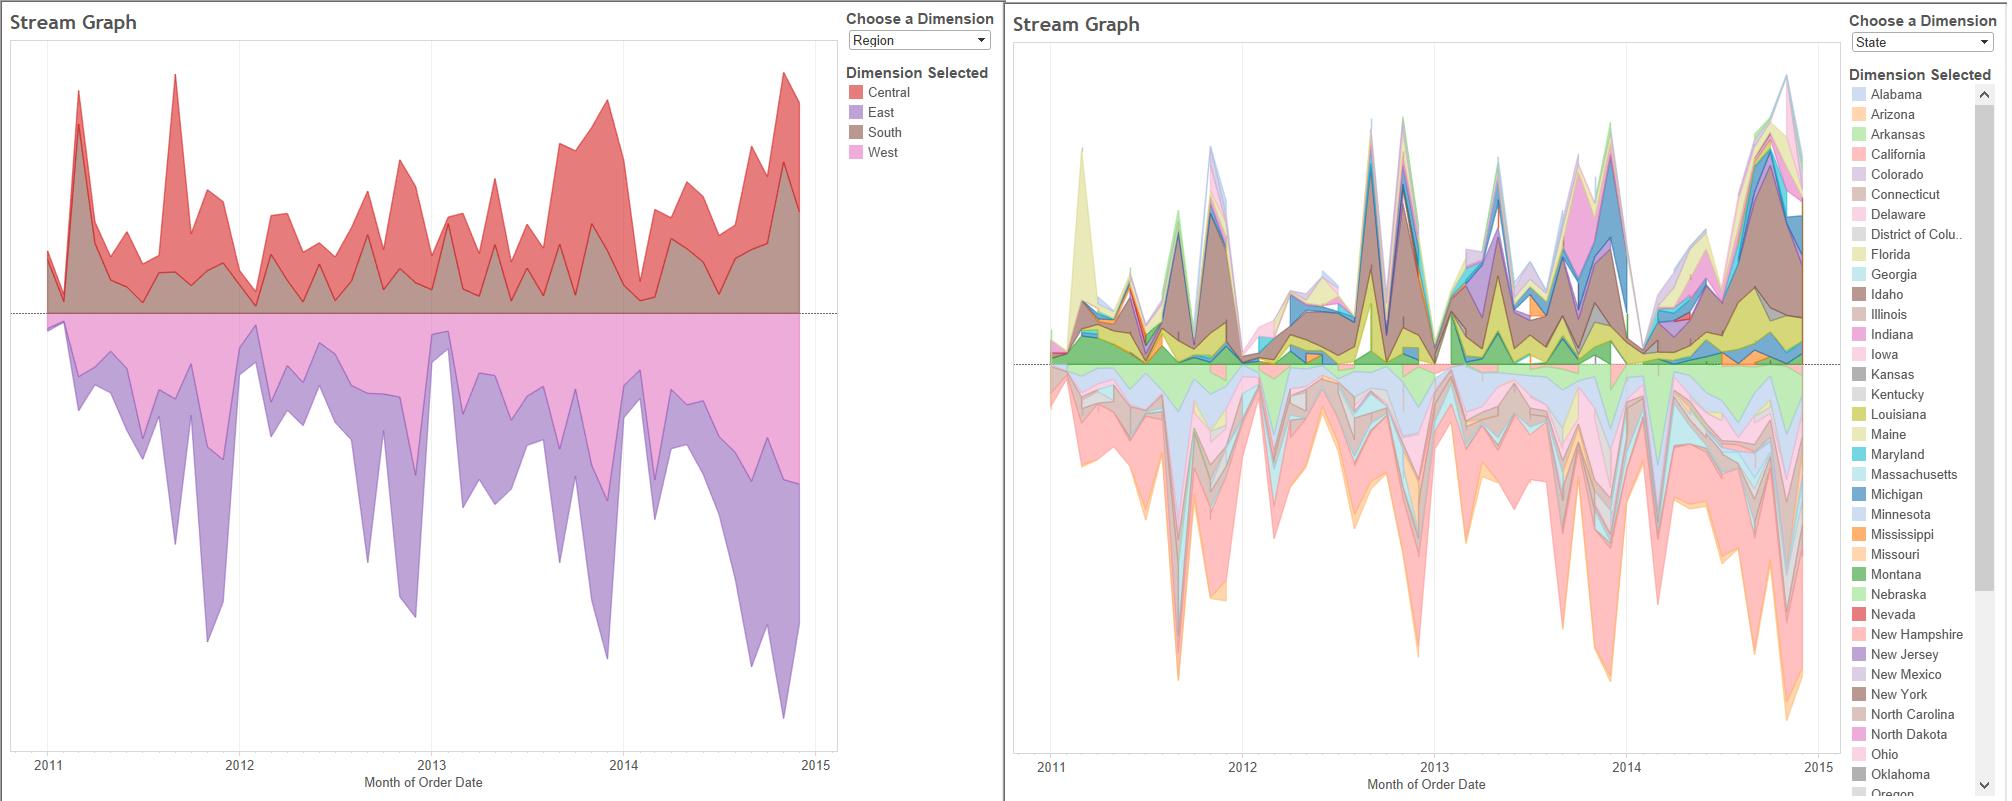 Stream Graphs